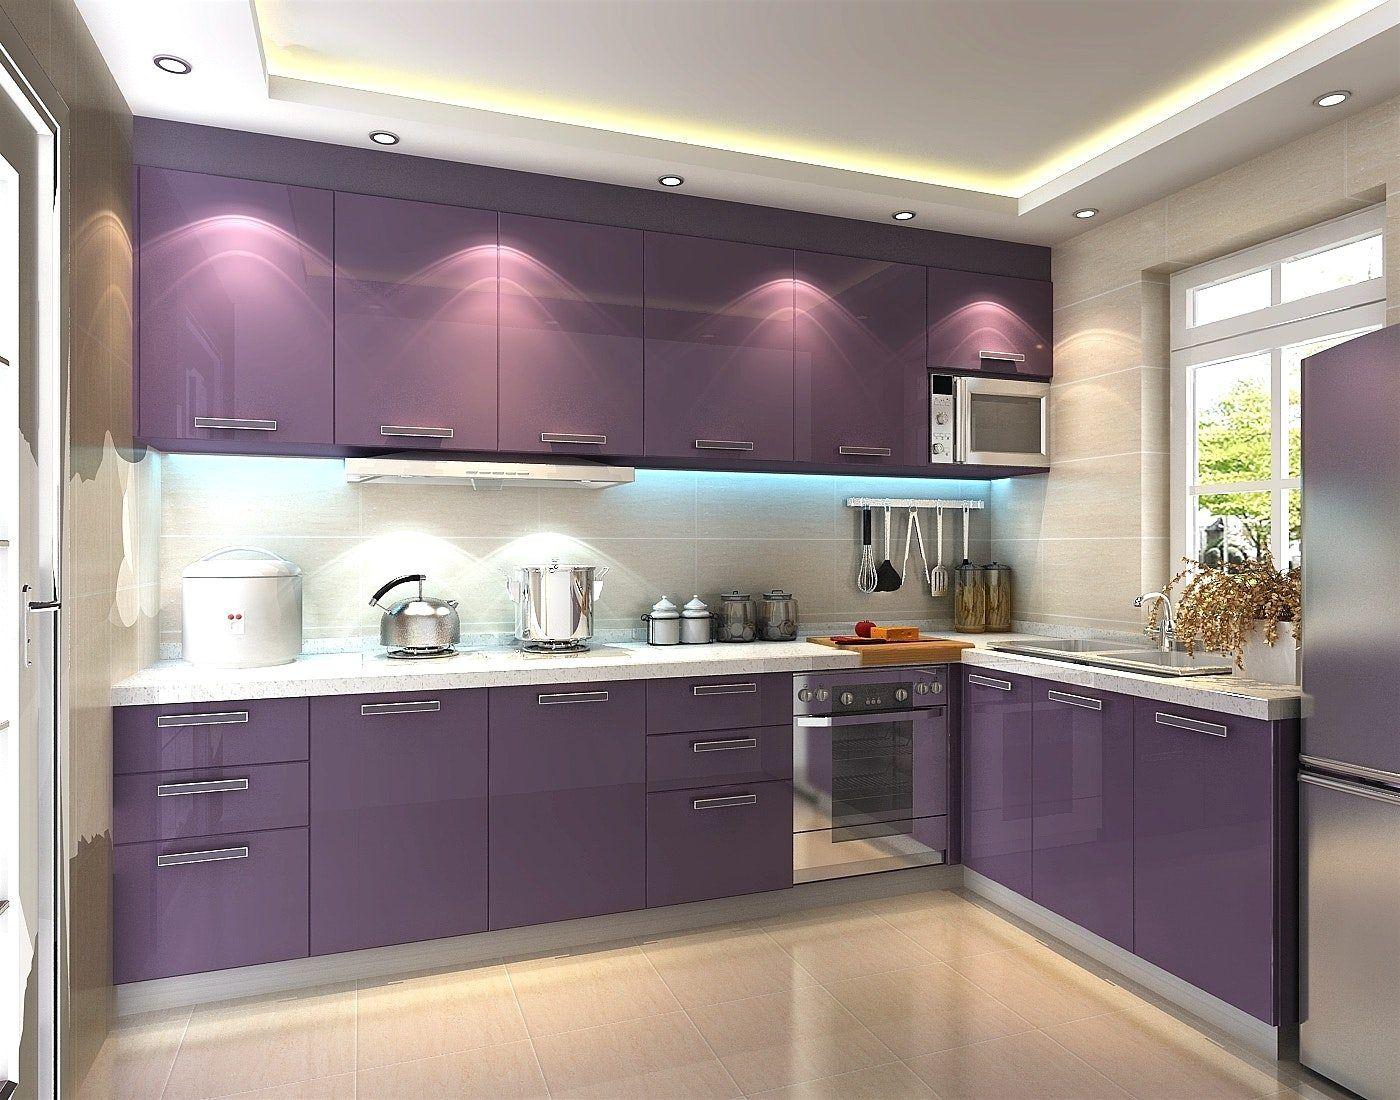 Charismatic Purple Kitchen Ideas Purple Kitchen Walls Kitchen Wall Design Purple Kitchen Cabinets